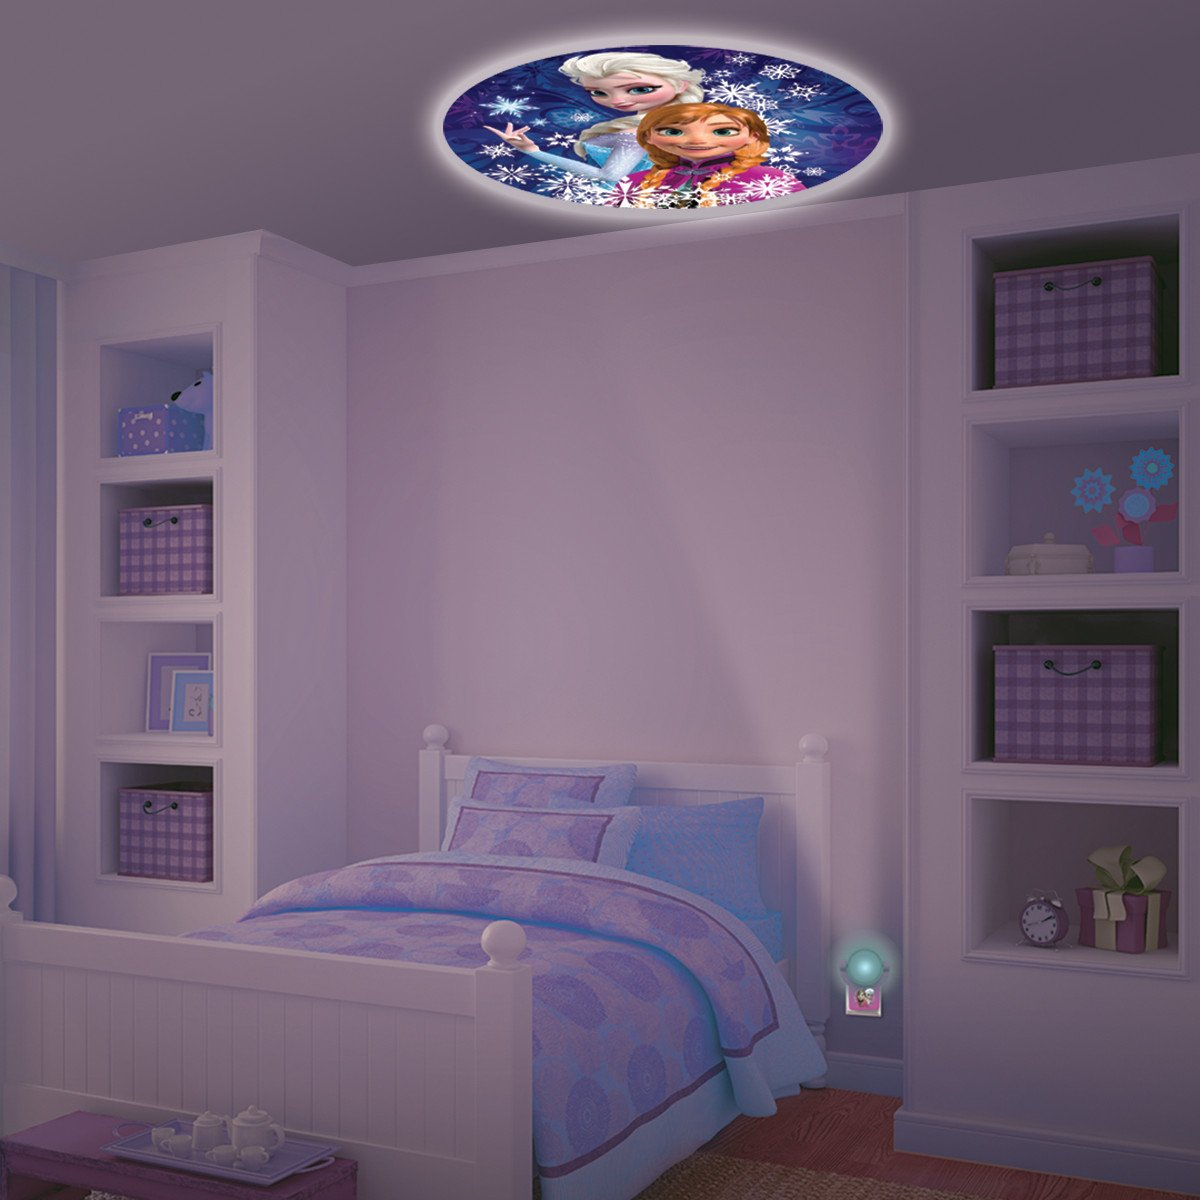 Projector Night Lights Disney Frozen LED Kids Boys Girls